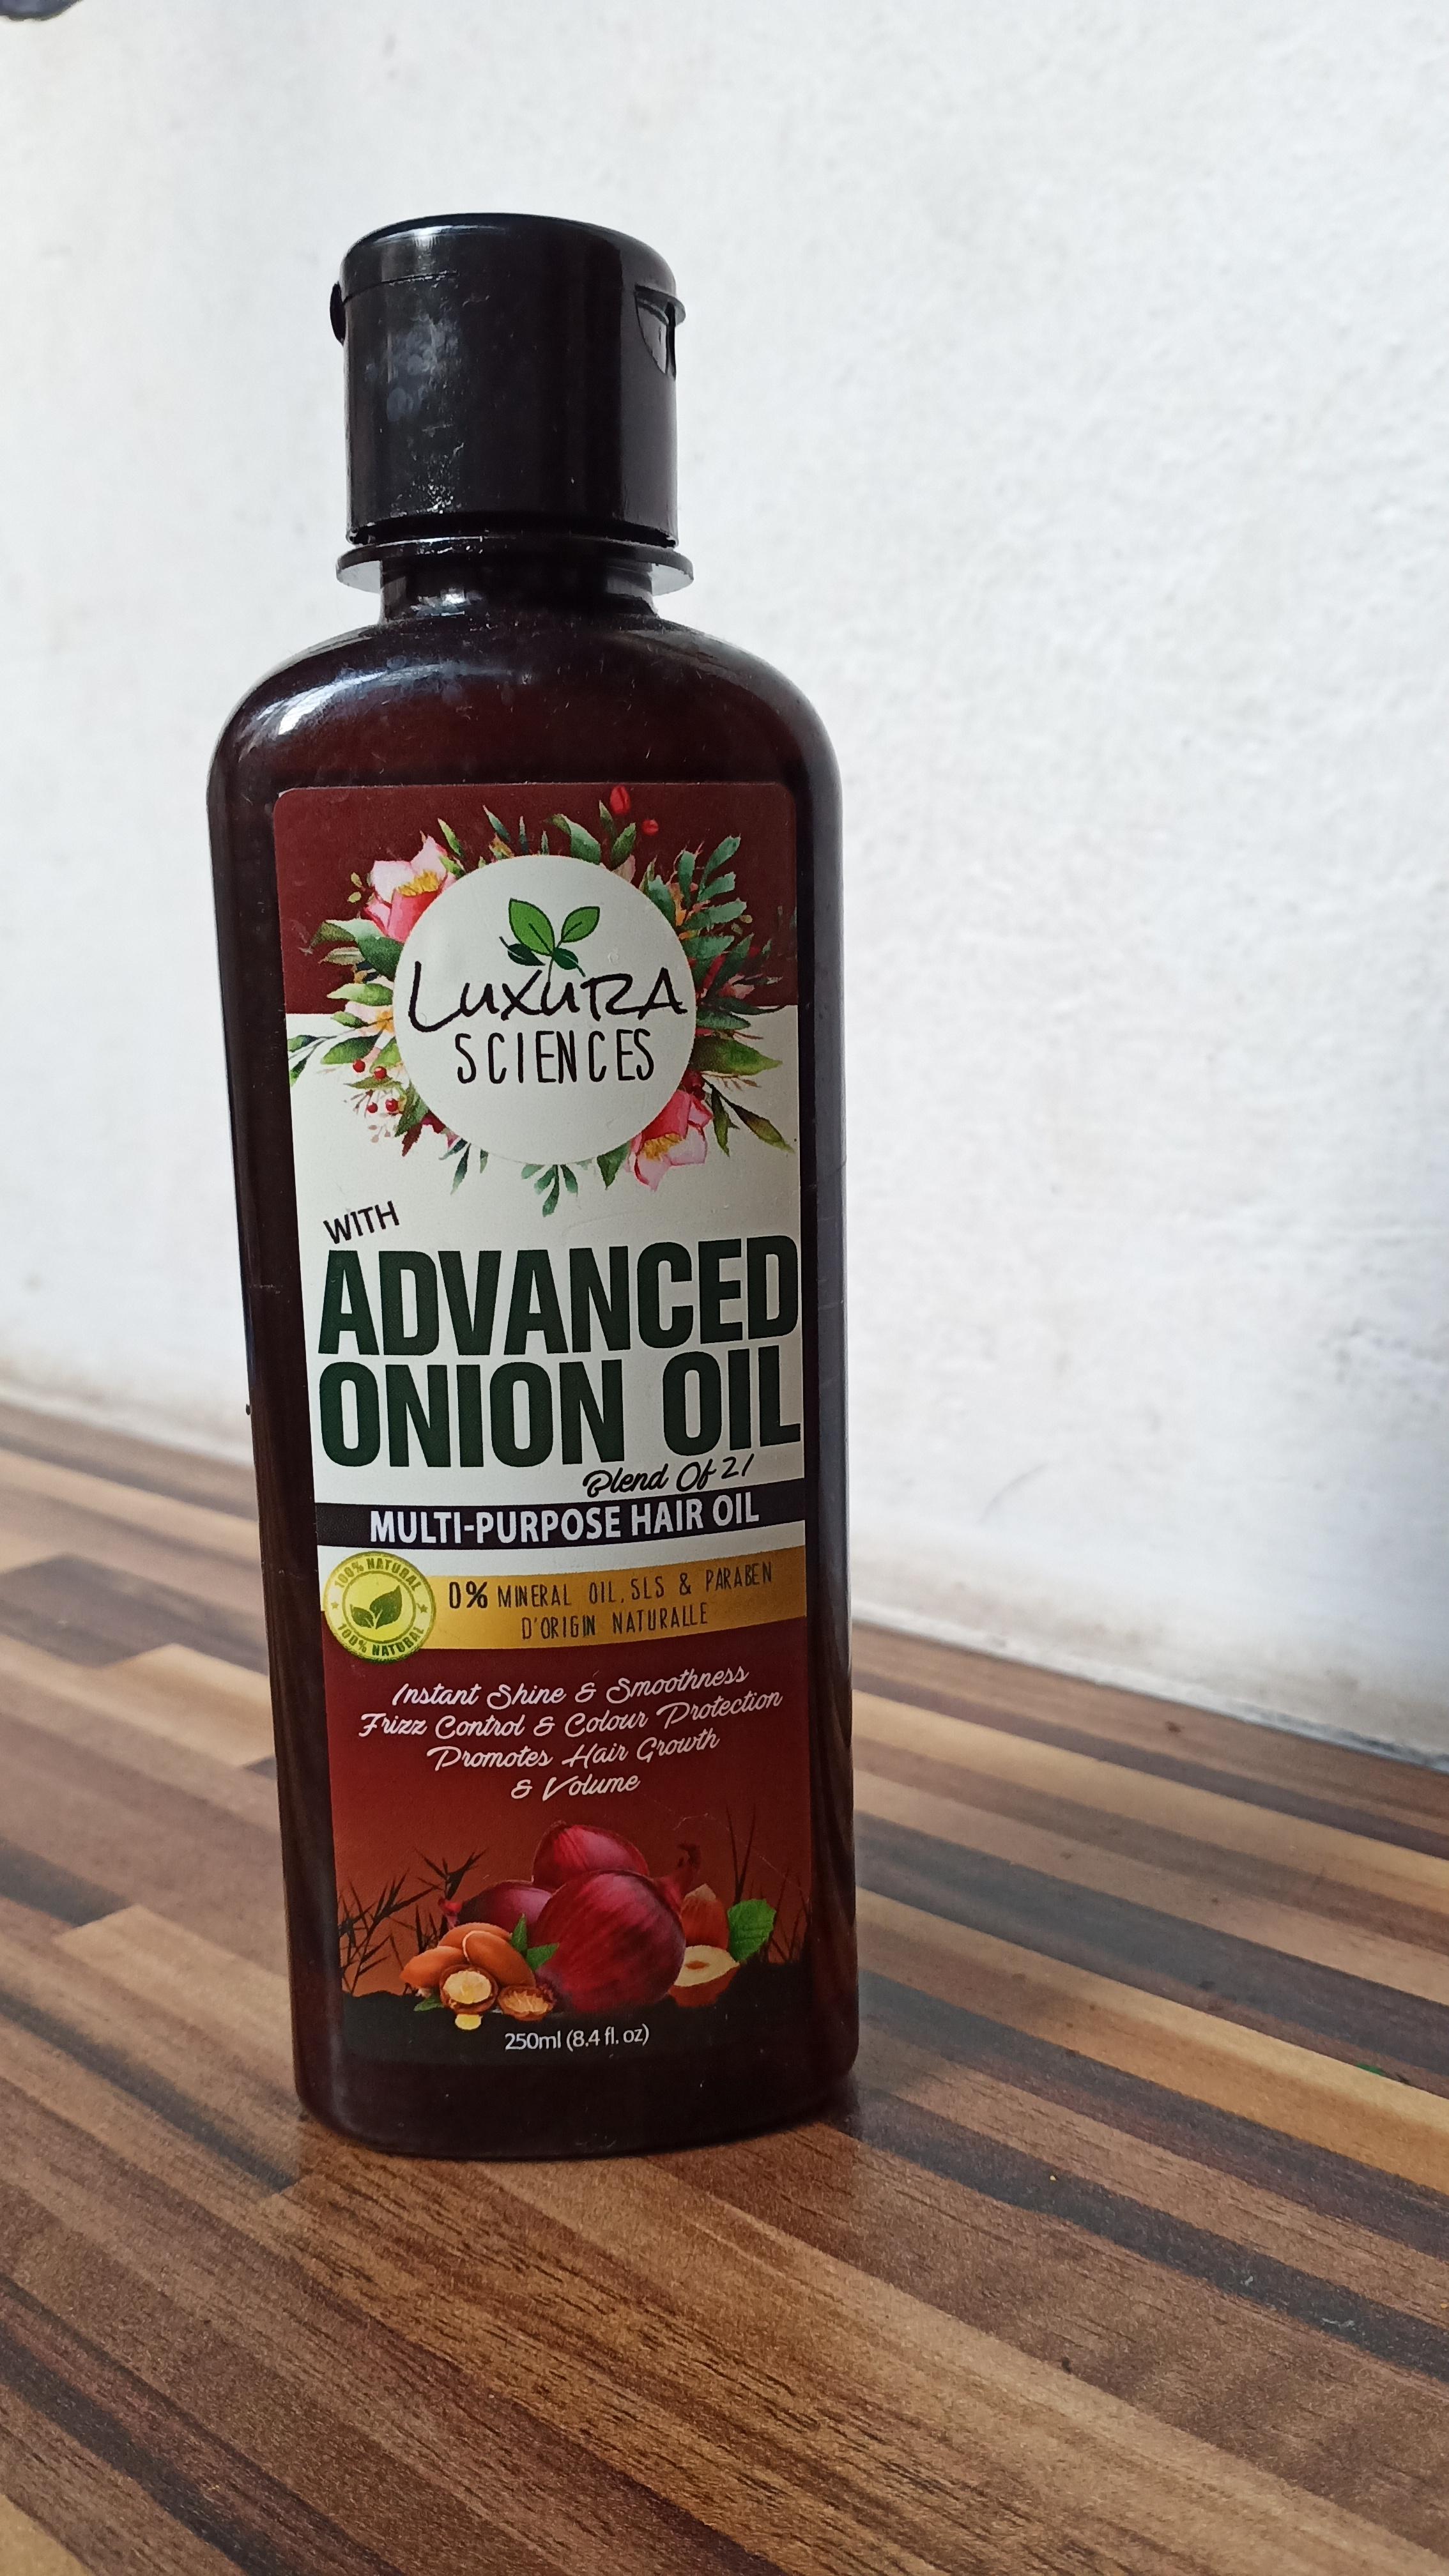 Luxura Sciences Advanced Onion Oil 250 ml-Onion oil-By ahana_sengupta